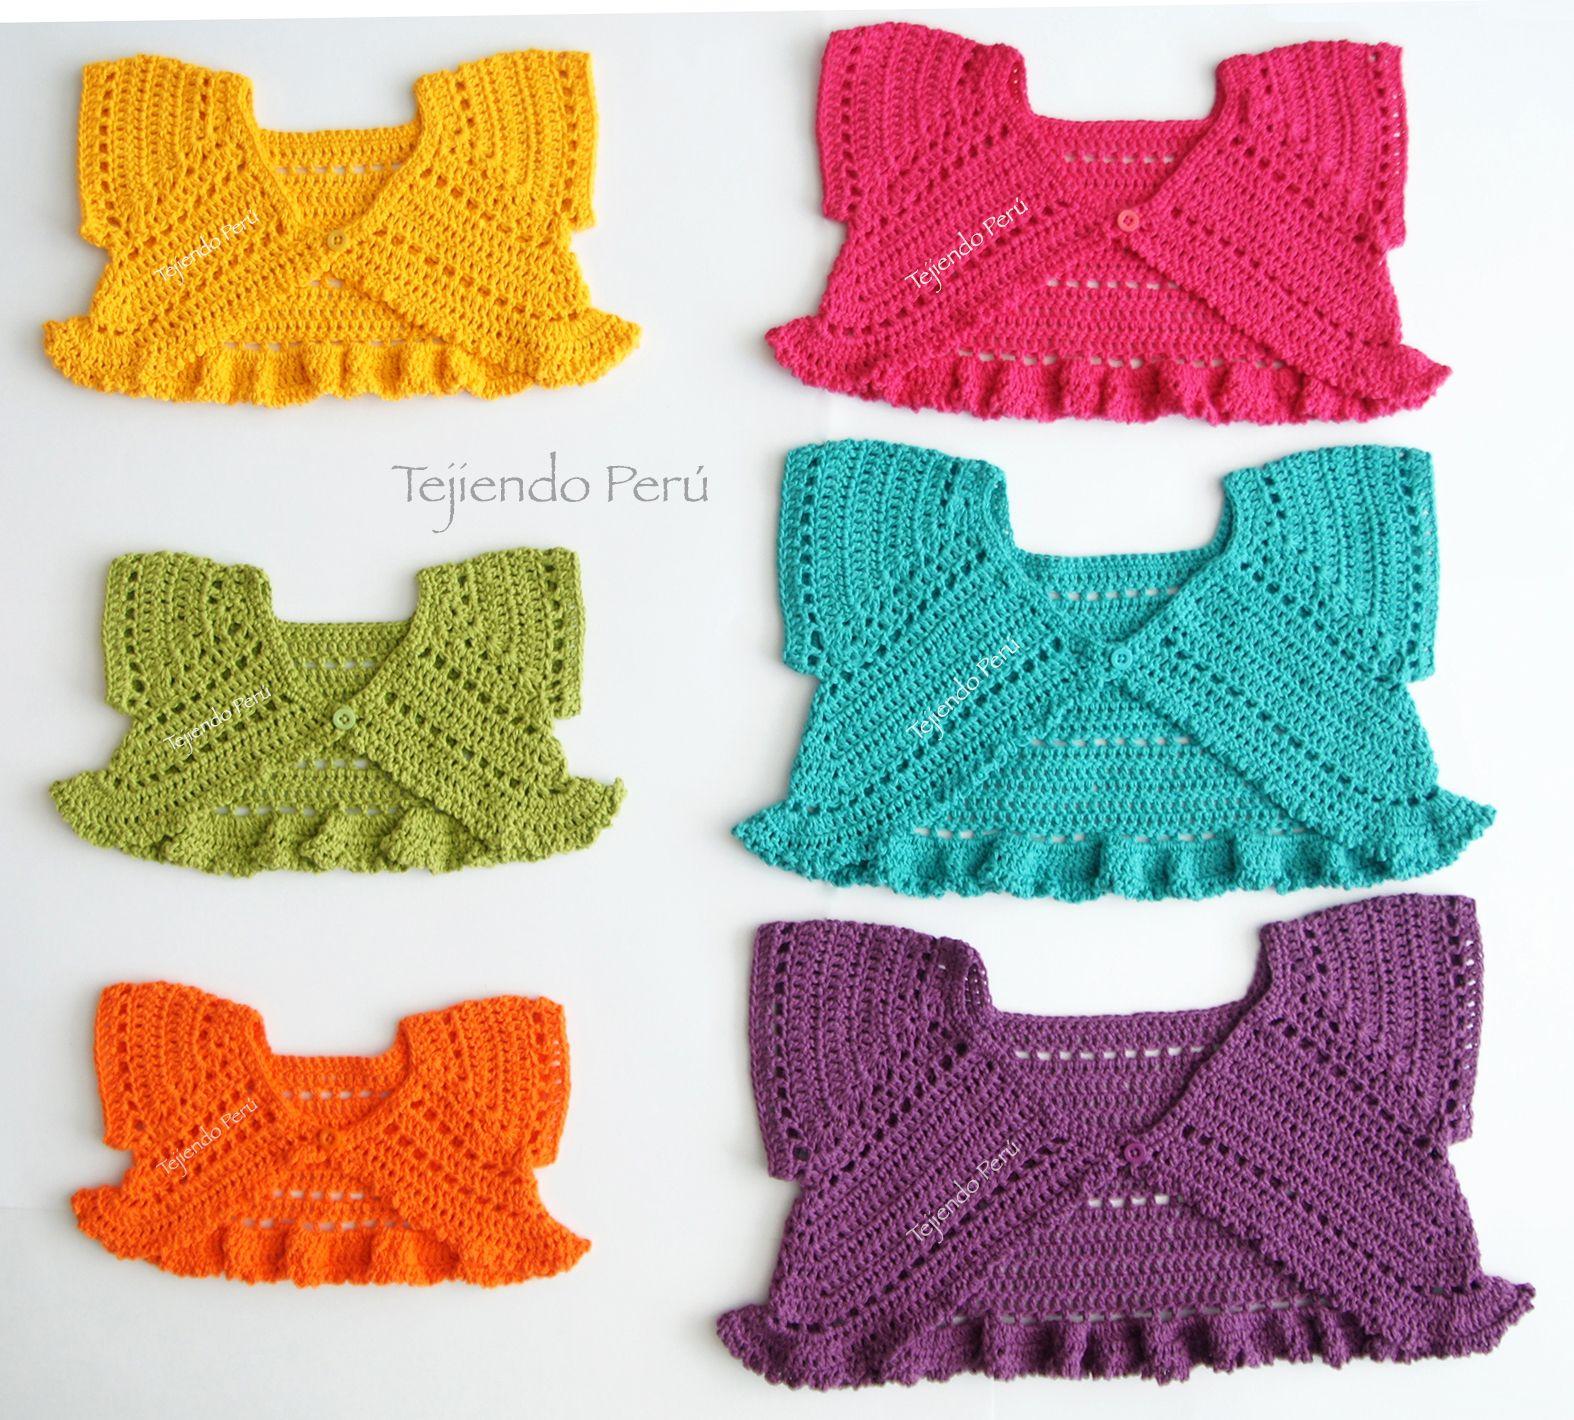 Crochet paso a paso: bolero mariposa para bebés y niñas! Explicación ...